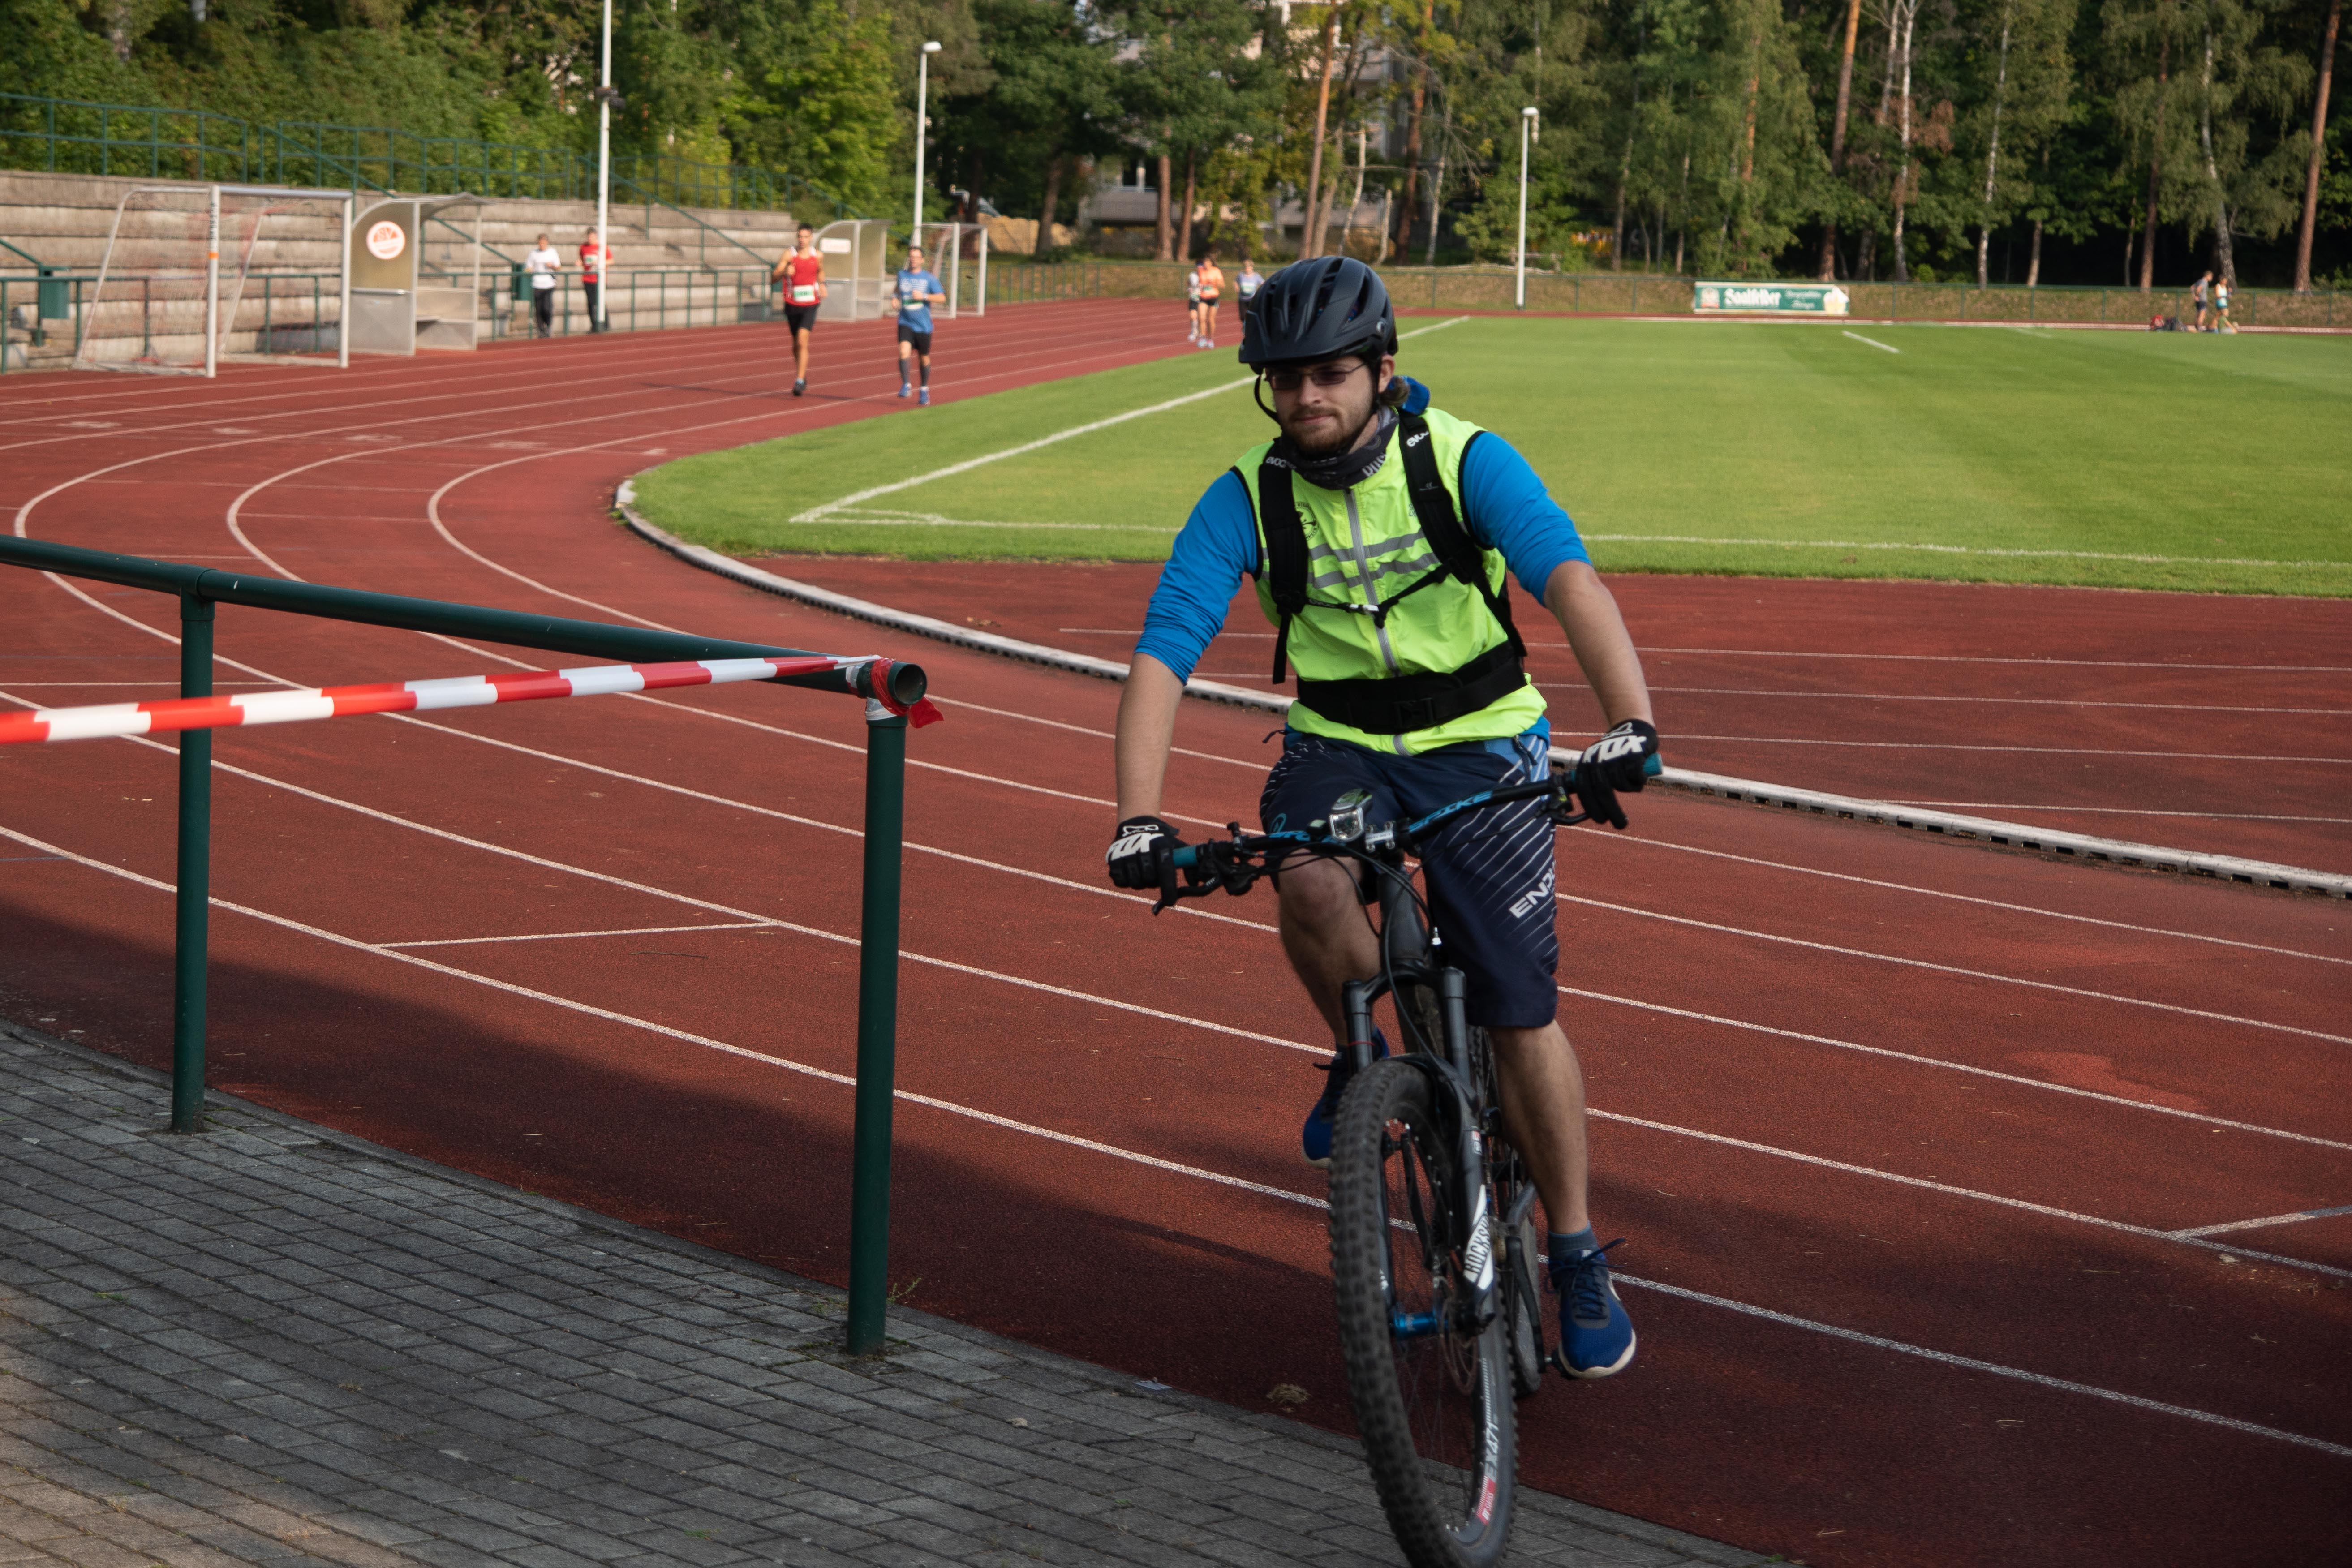 44.-Holzlandlauf-12.-September-2020-0033